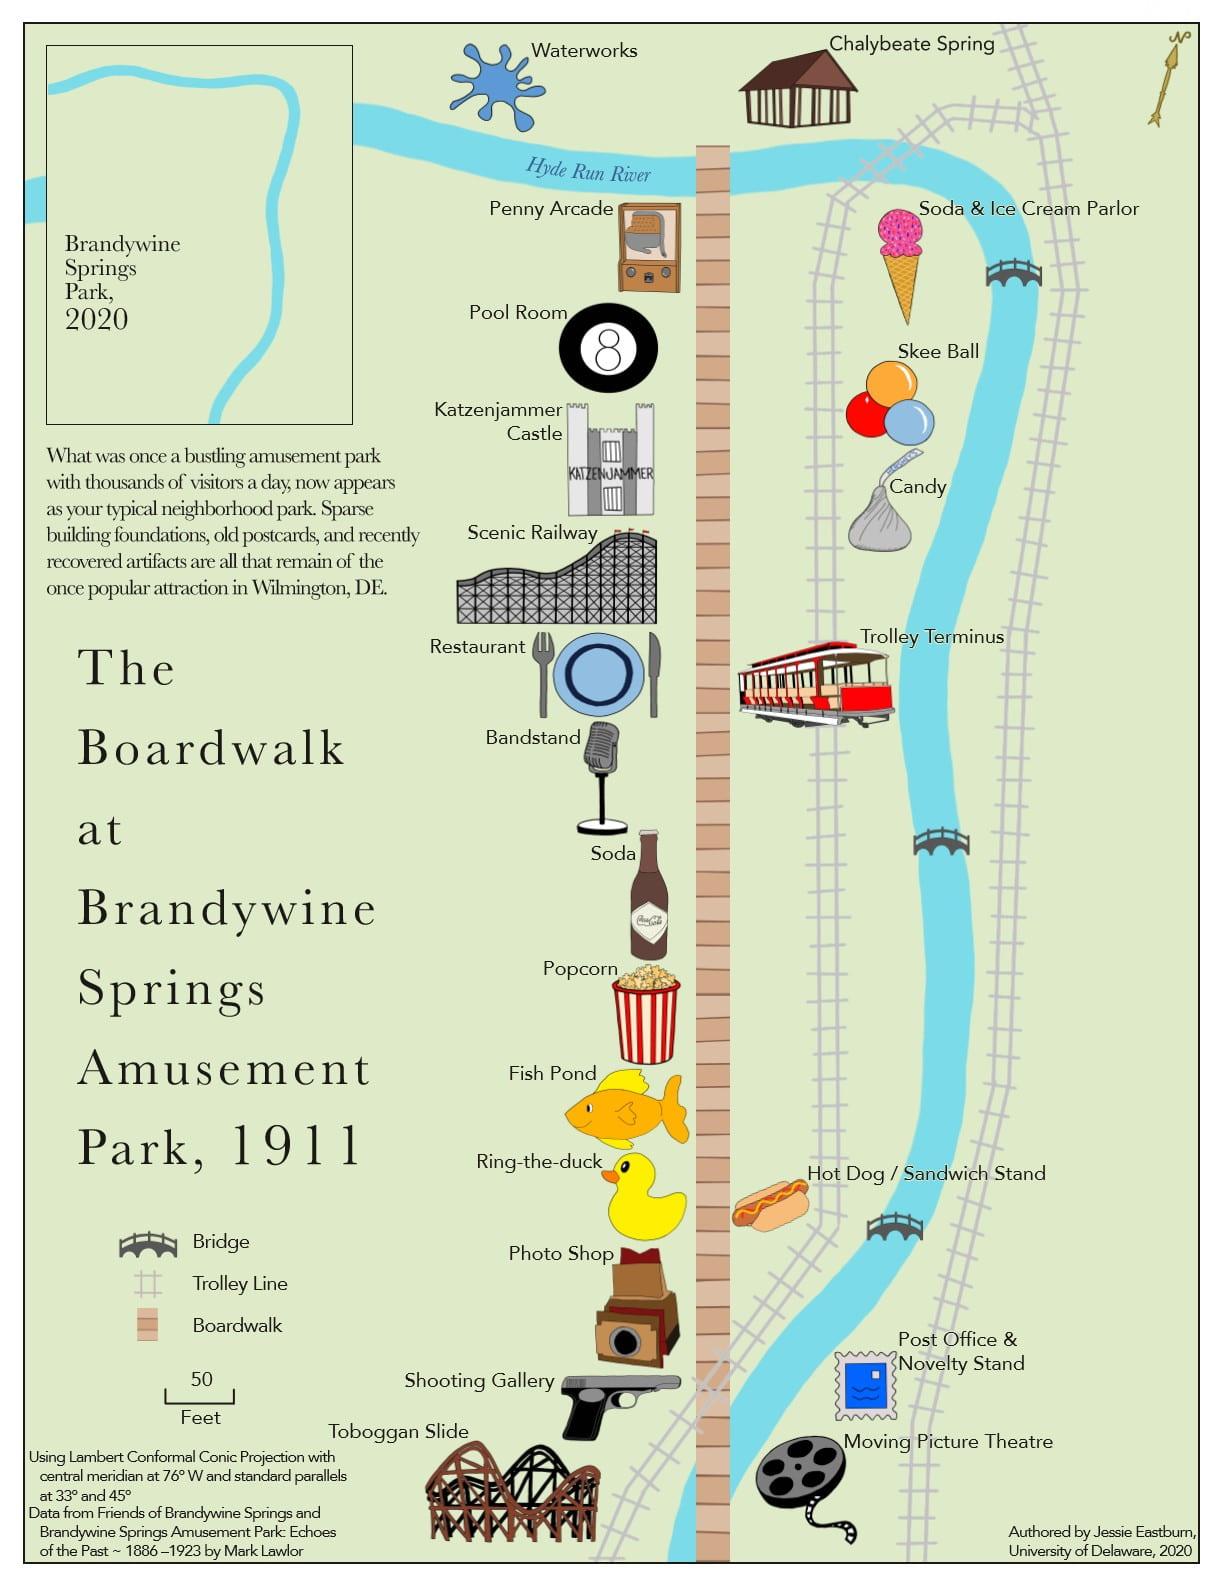 2020 Winner Map from Jessie Eastburn - Brandywine Springs Park, Wilmington, DE in 1911 vs. 2020